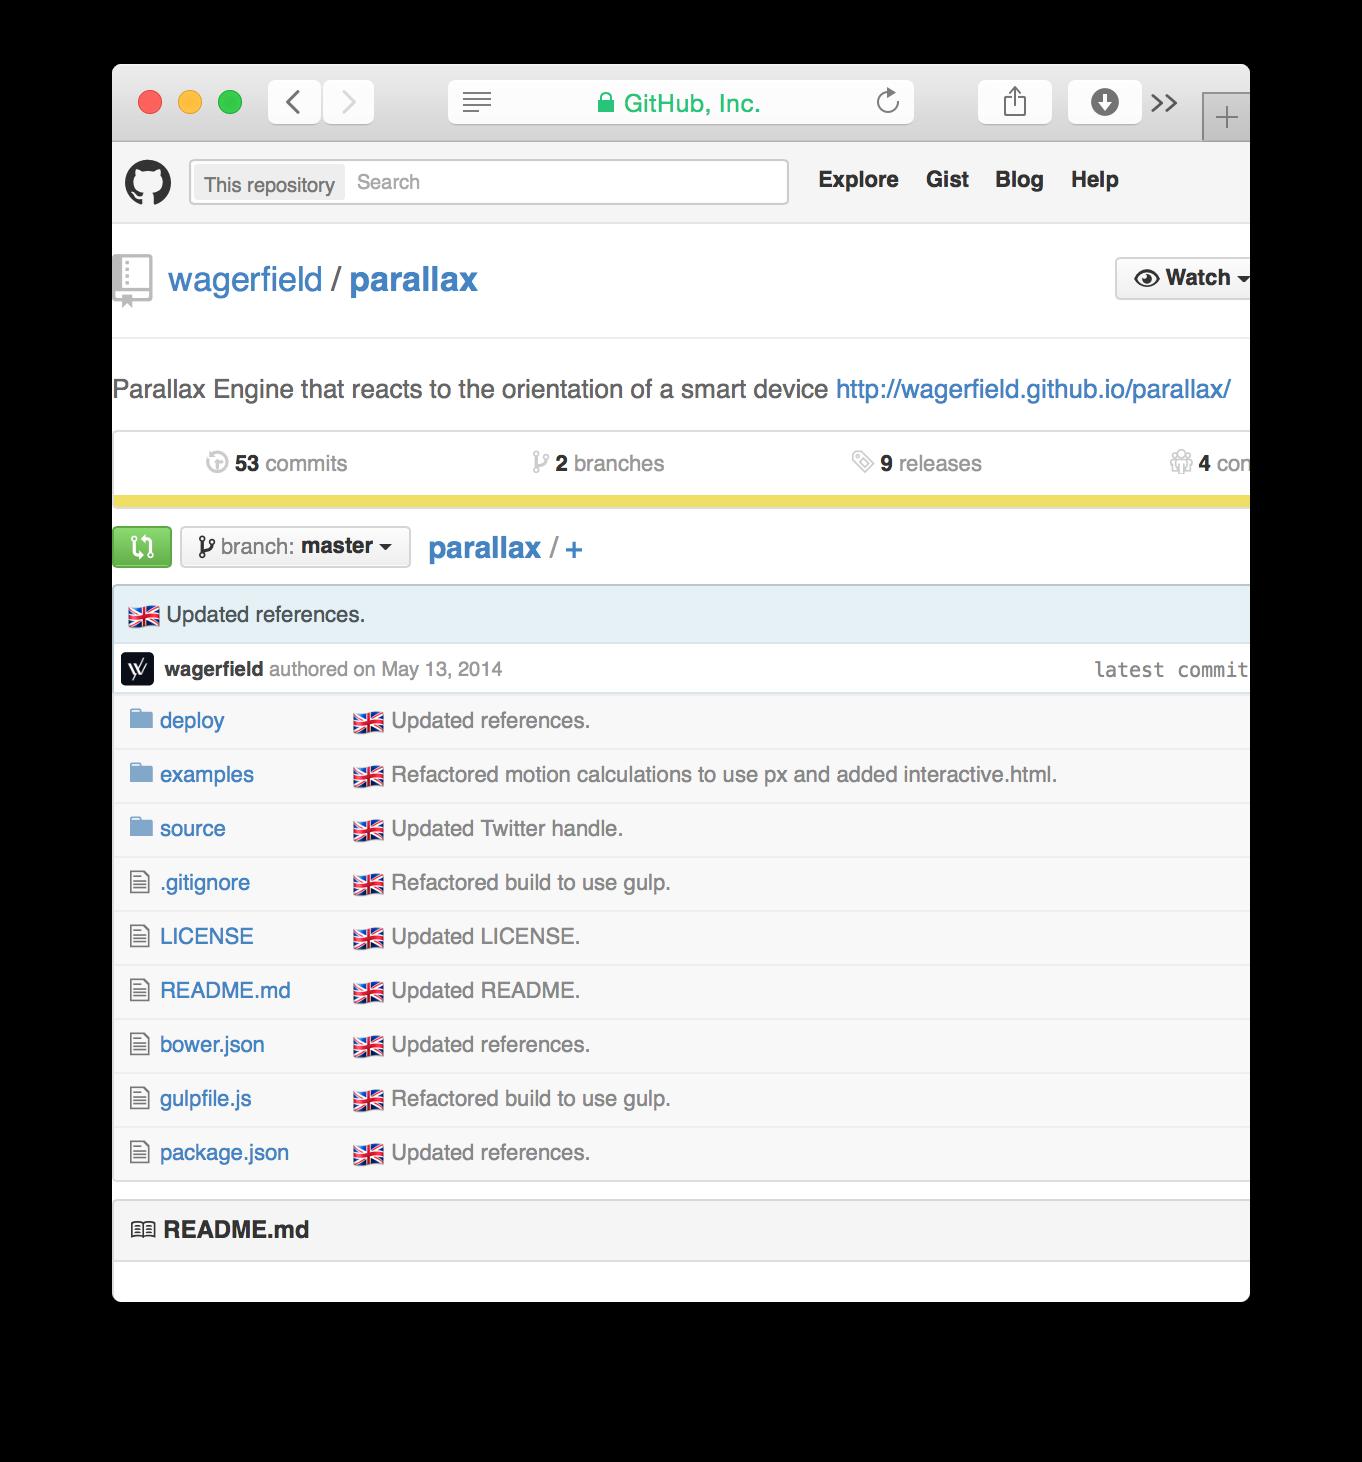 Github.com parallax repository